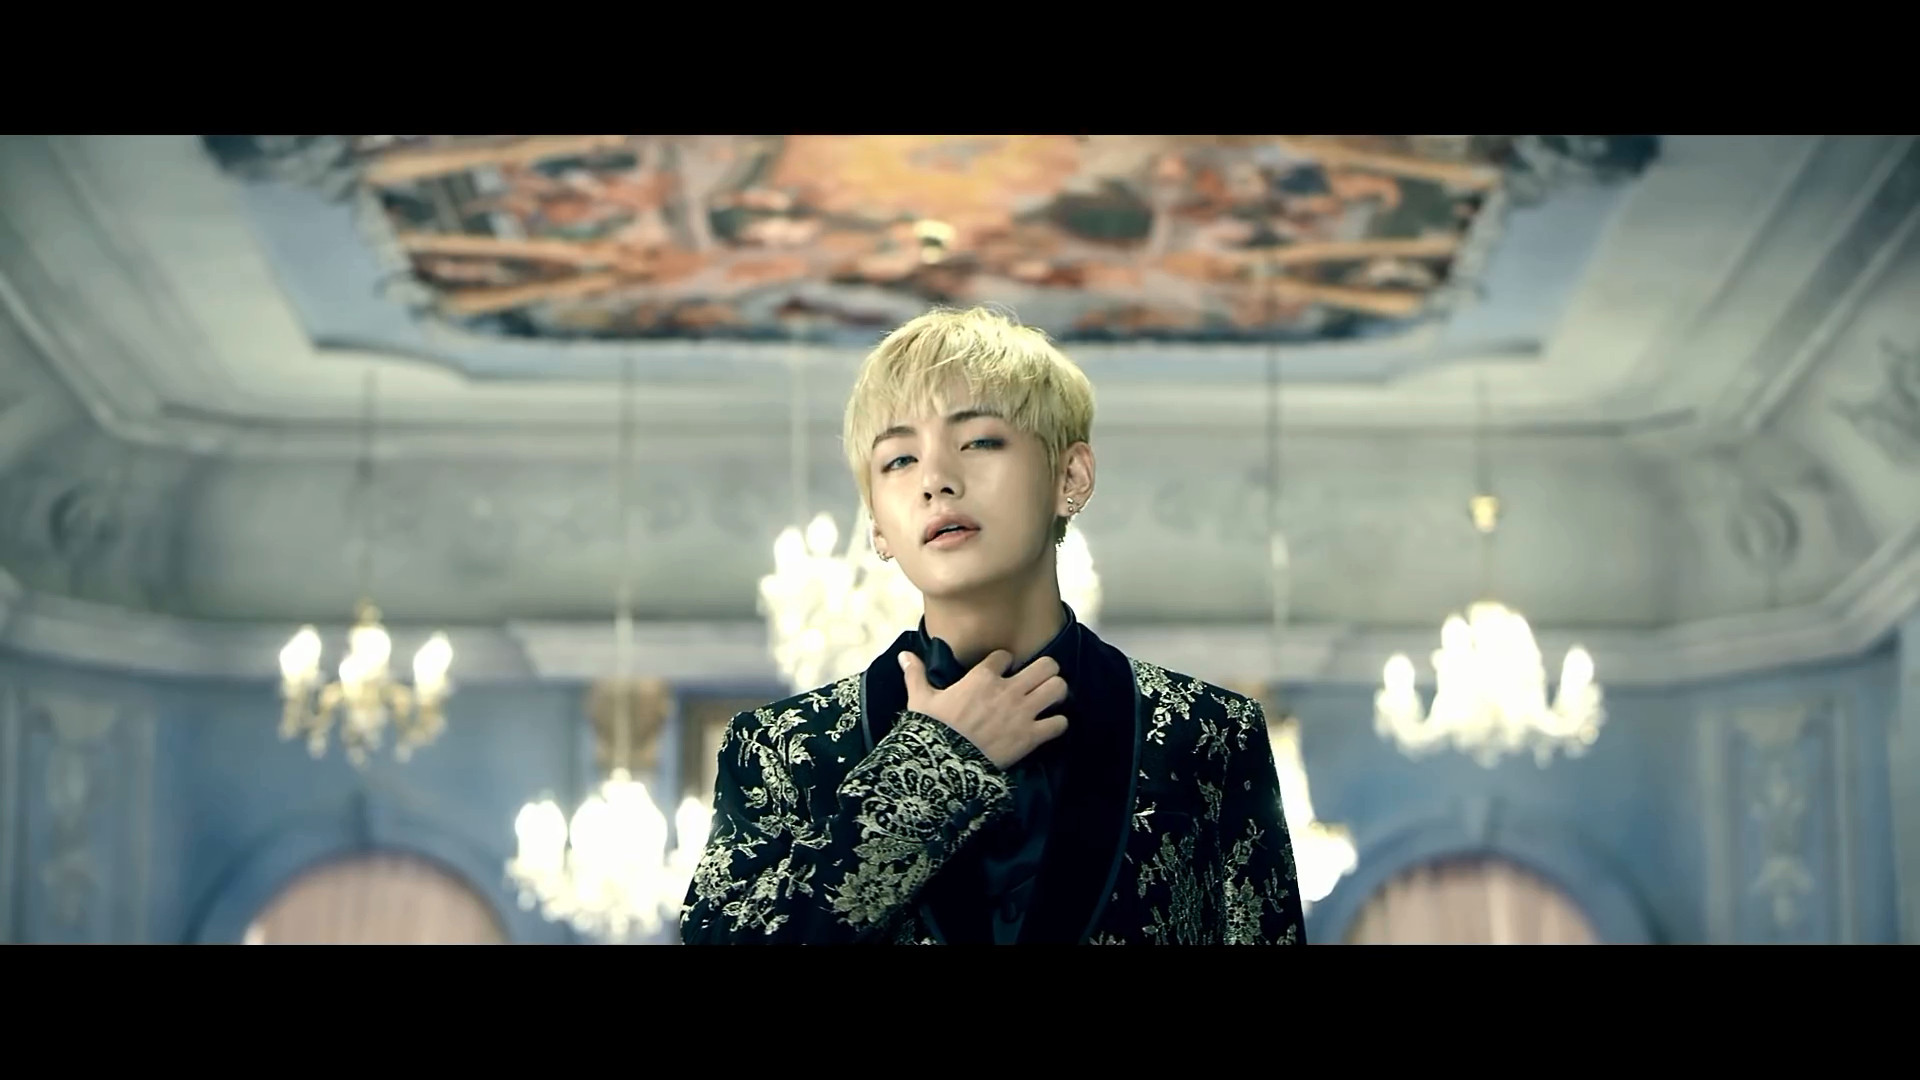 Korea Korean Kpop Idol Boy Band Group Bts Blood Sweat Tears